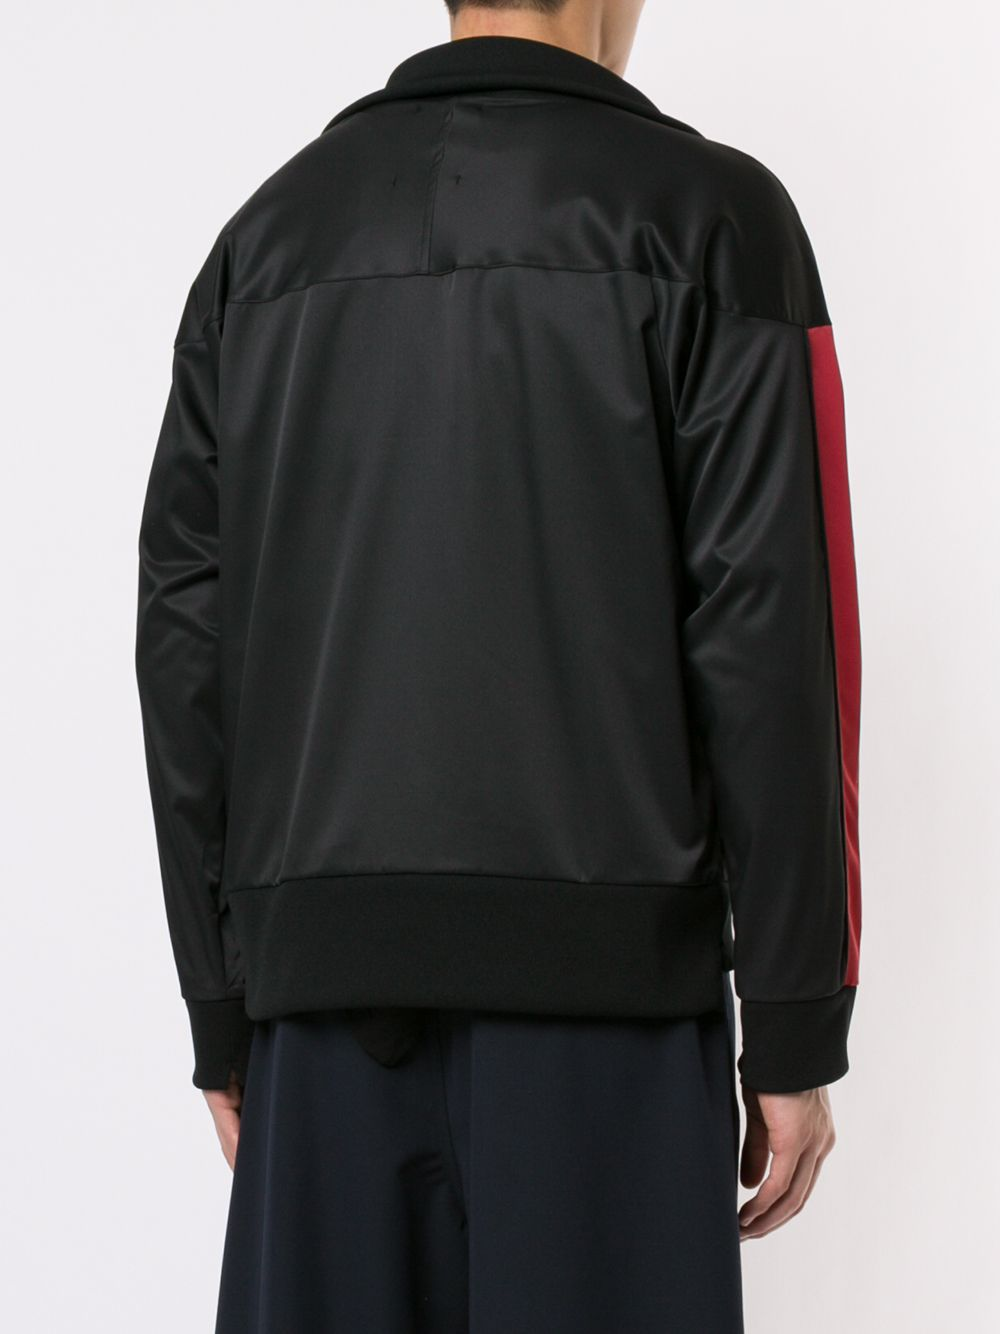 Maison Mihara Yasuhiro | куртка-бомбер с полосками по бокам | Clouty